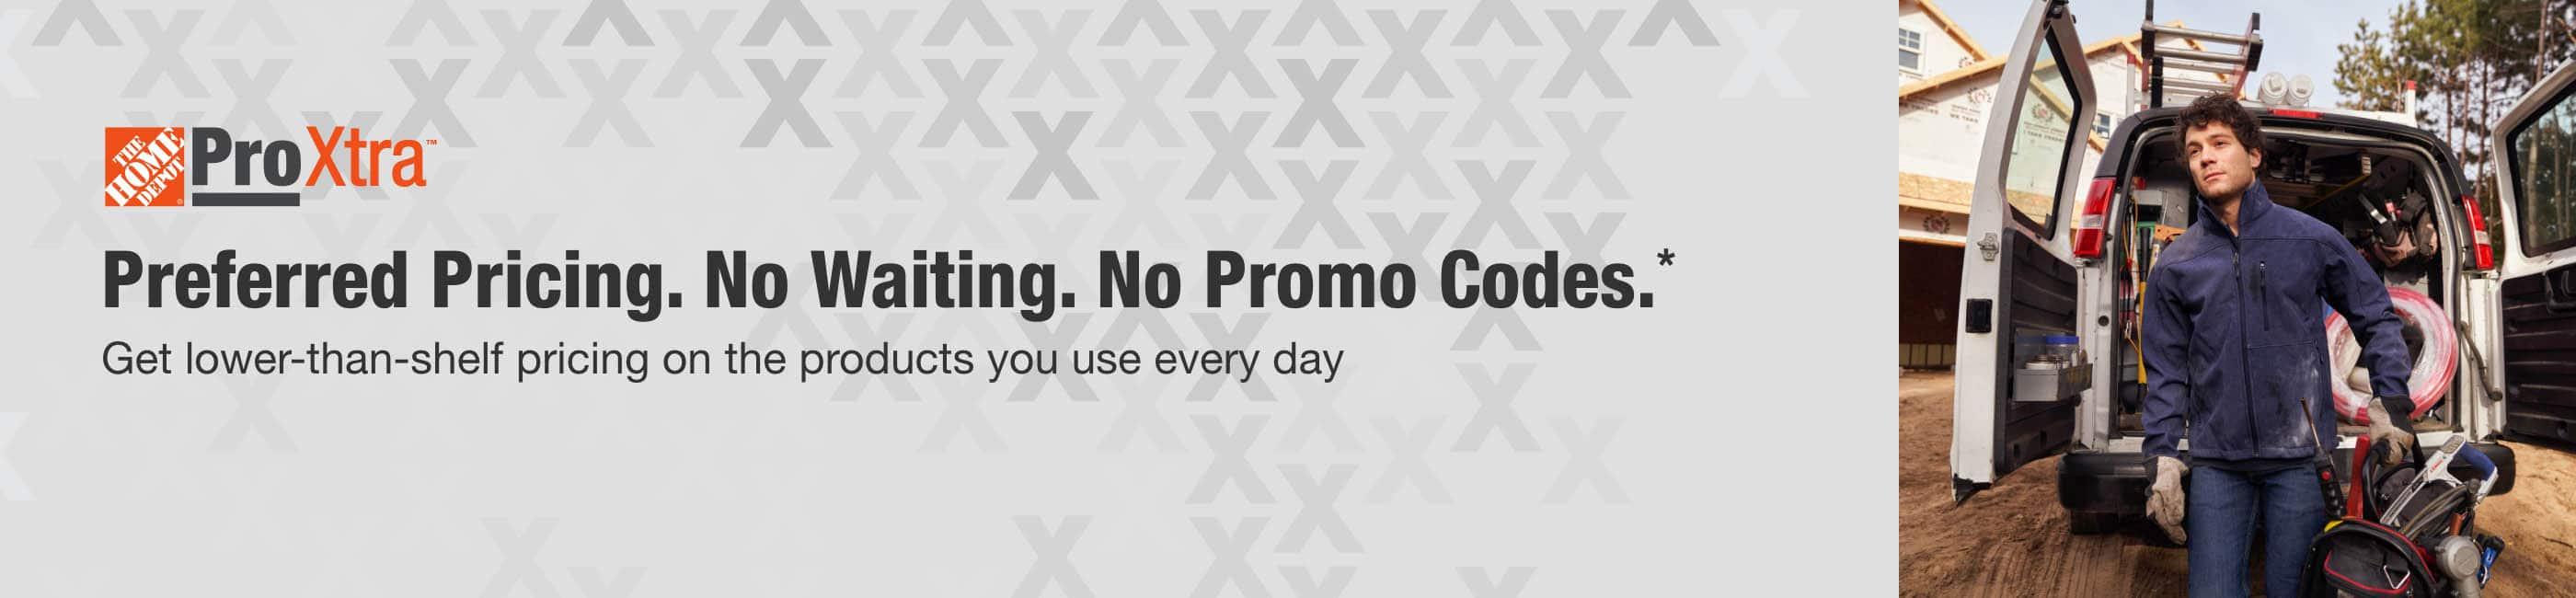 Preferred Pricing. No Waiting. No Promo Codes.*